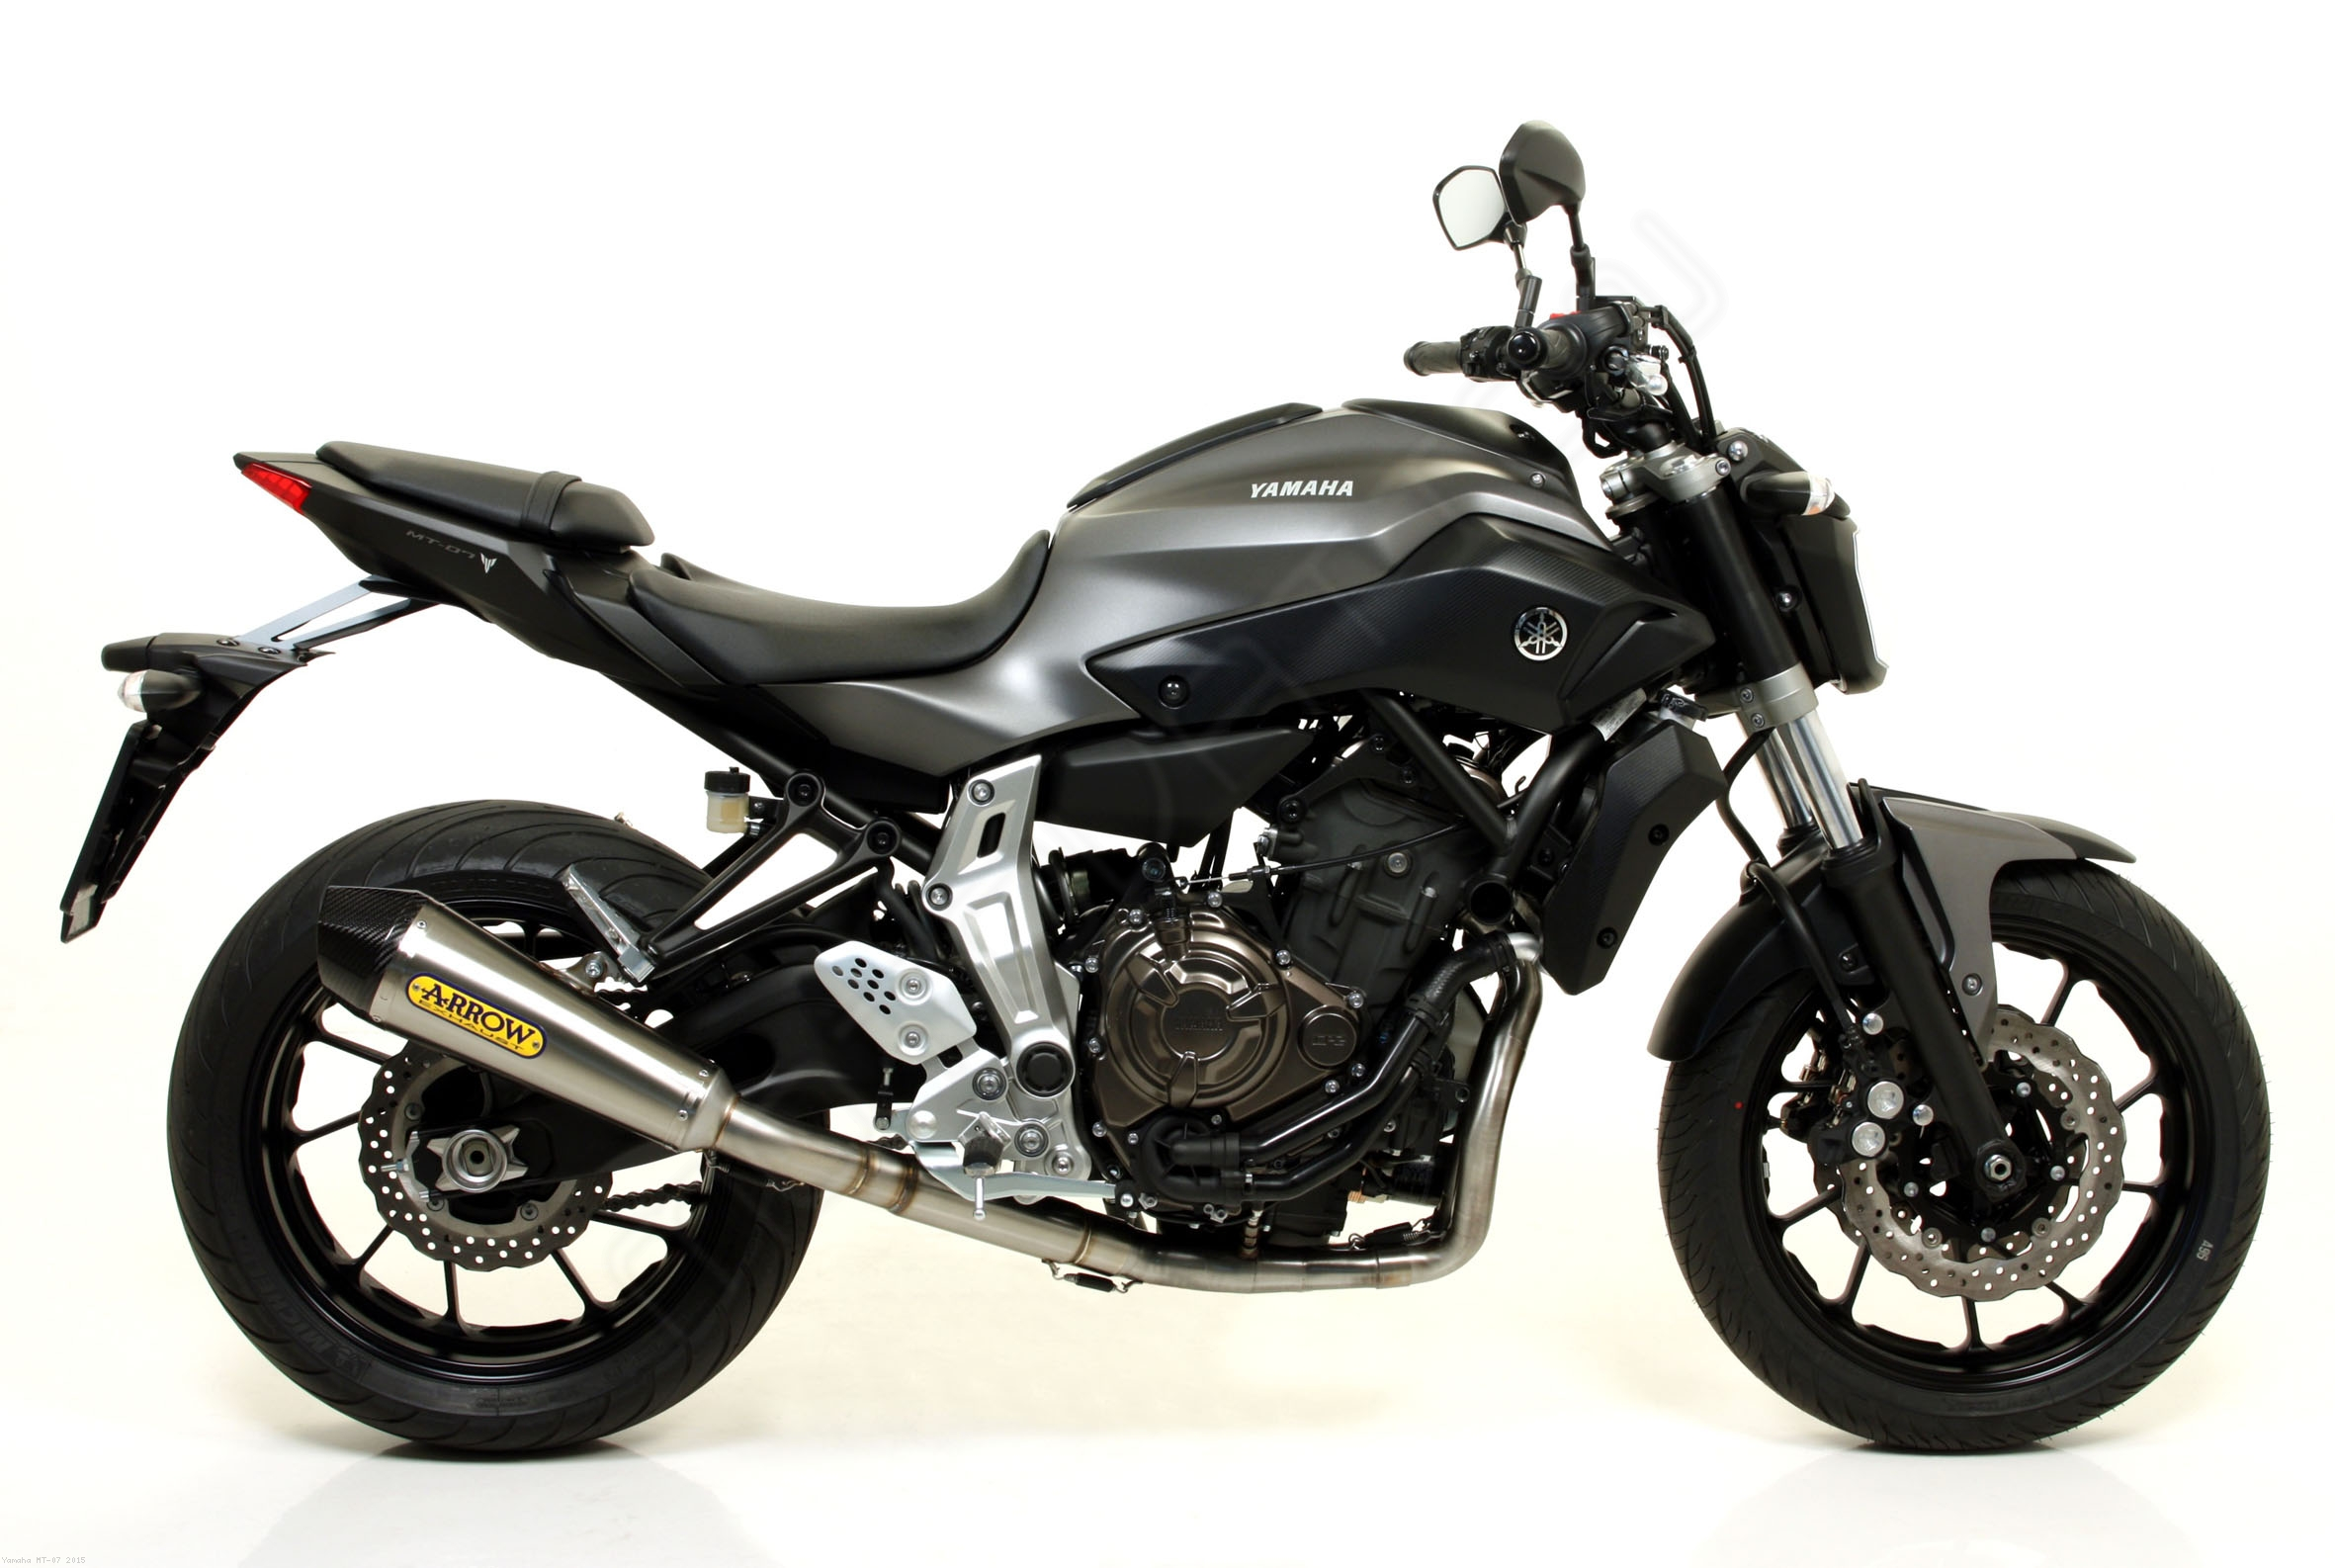 2015-18 Yamaha FZ-07/MT-07 Full System - Shop M4 Exhaust